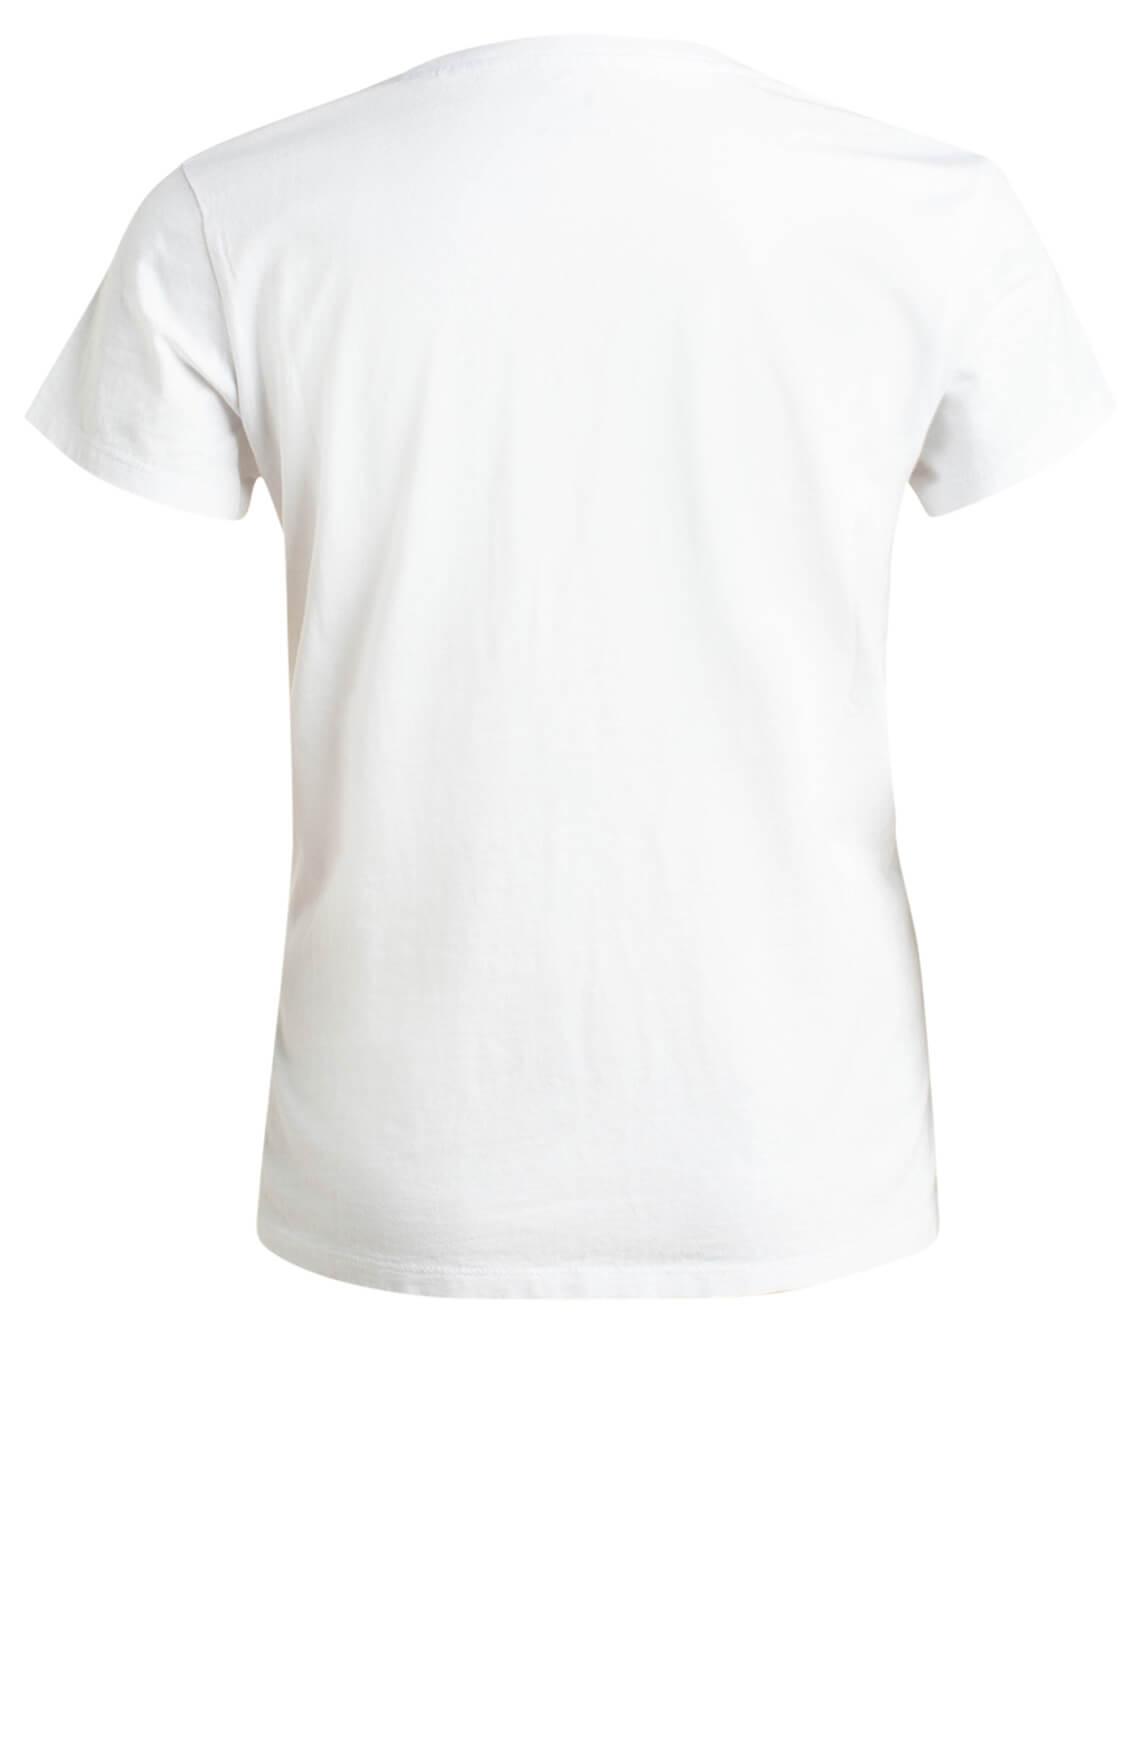 Levi s Dames Shirt met tekst opdruk wit